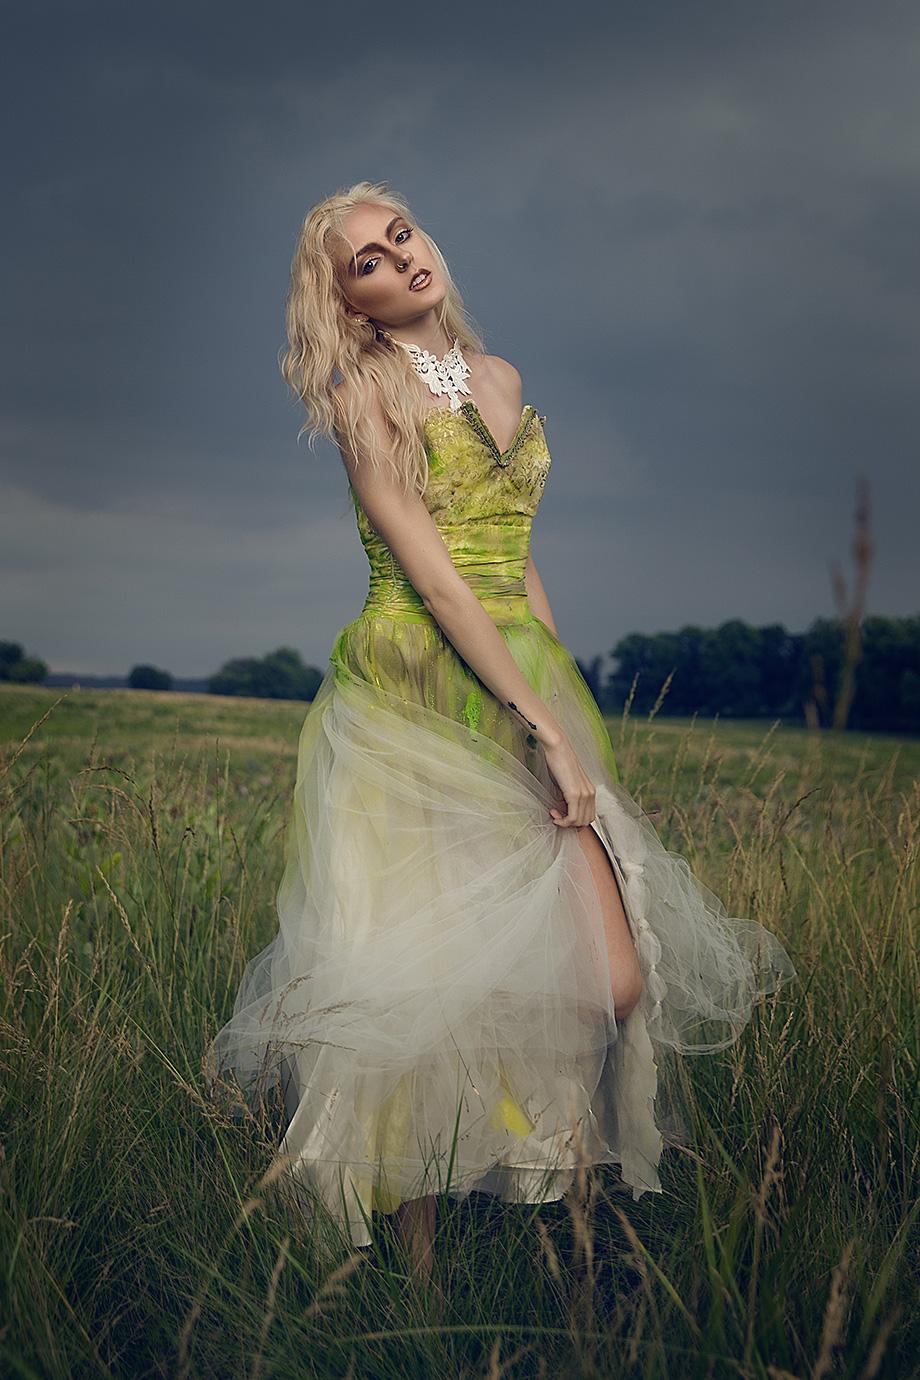 20140622_Princess_of_the_wild_Live_Work-14.jpg